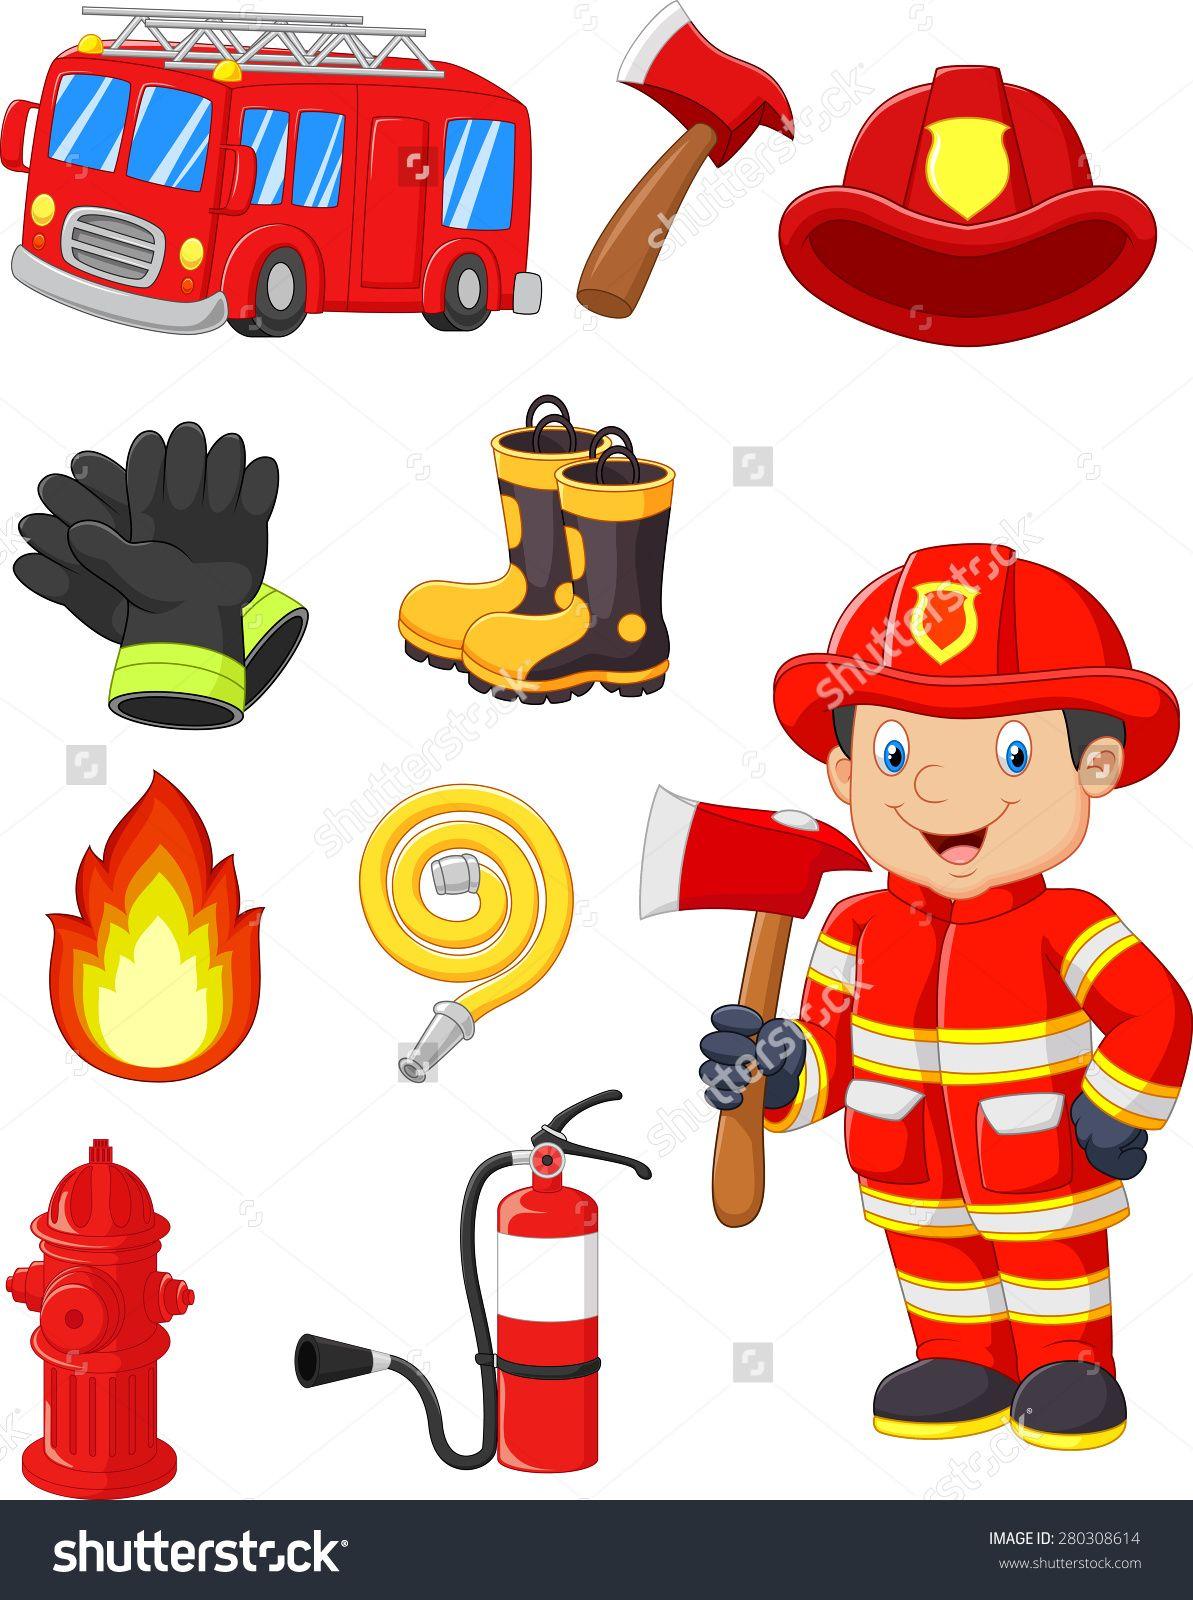 Stock Vector Cartoon Collection Of Fire Equipment